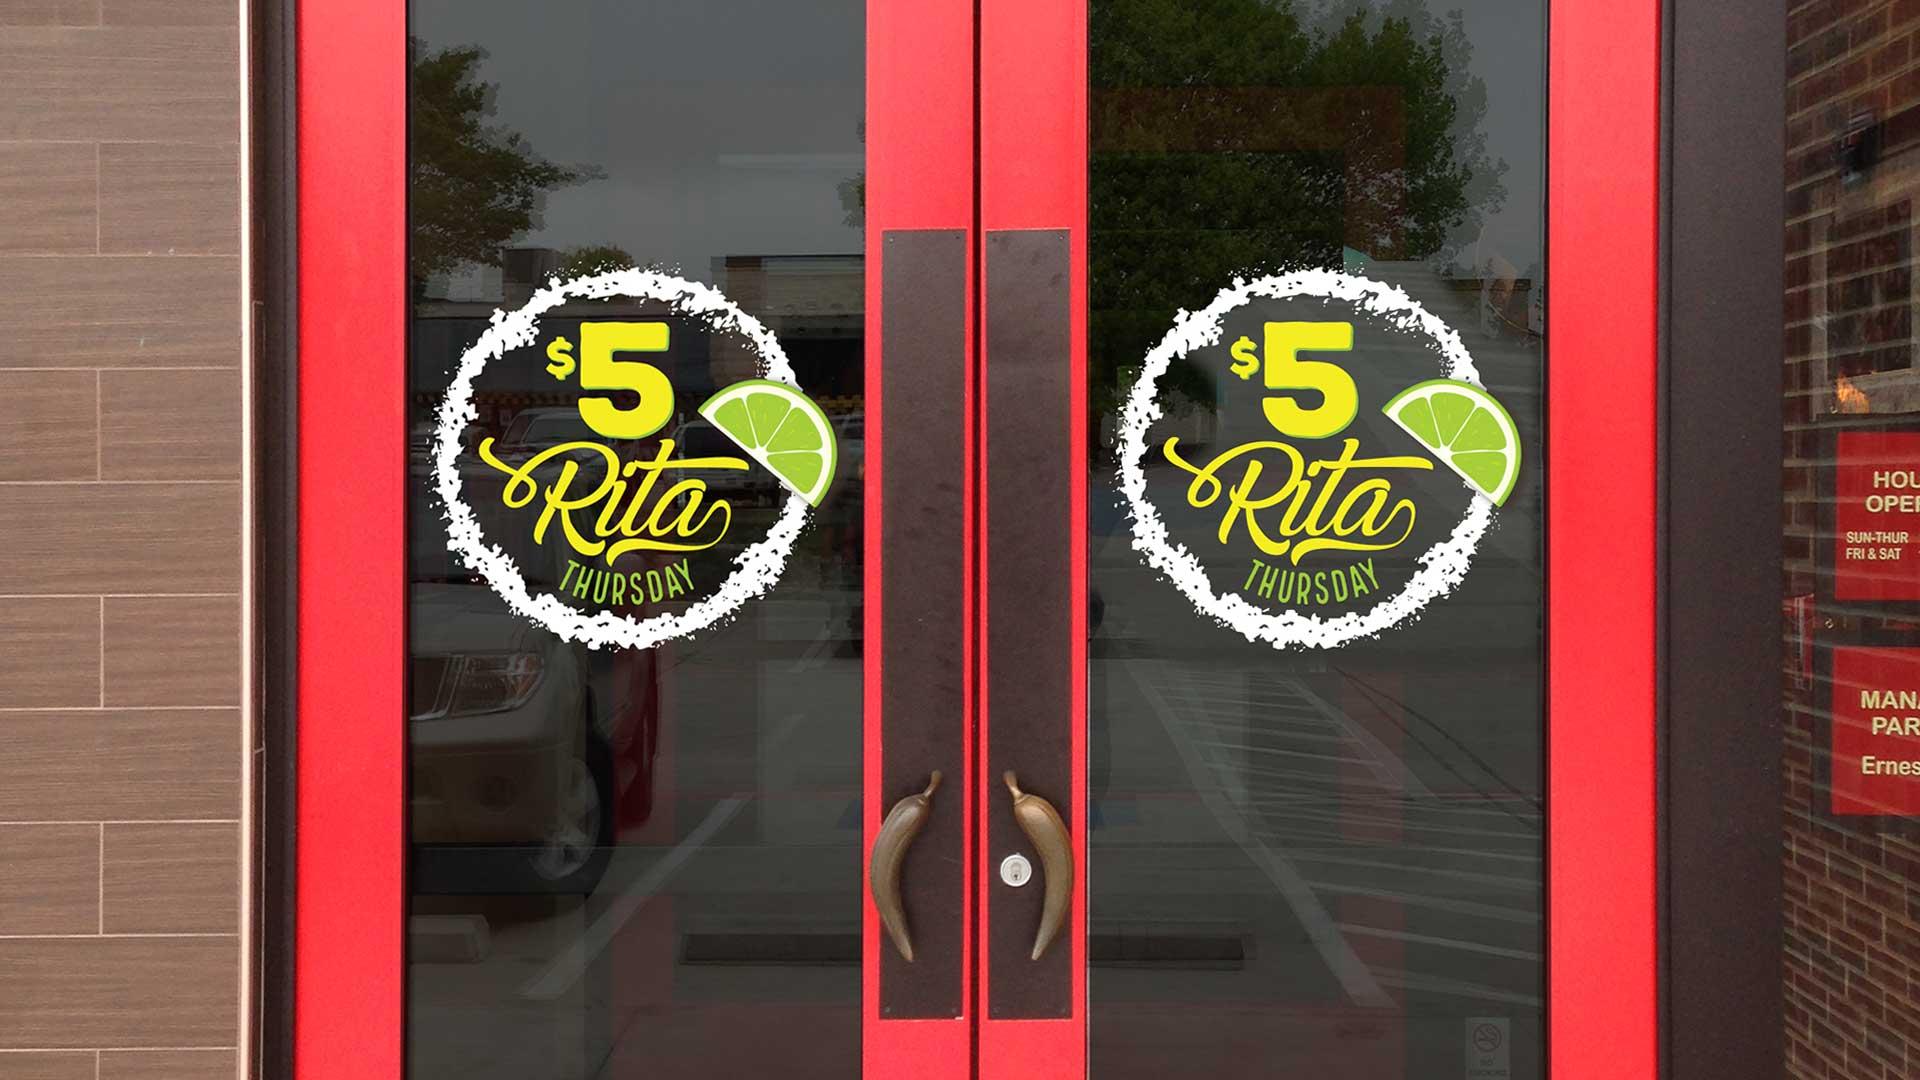 chilis-rita-thursday-door-clings